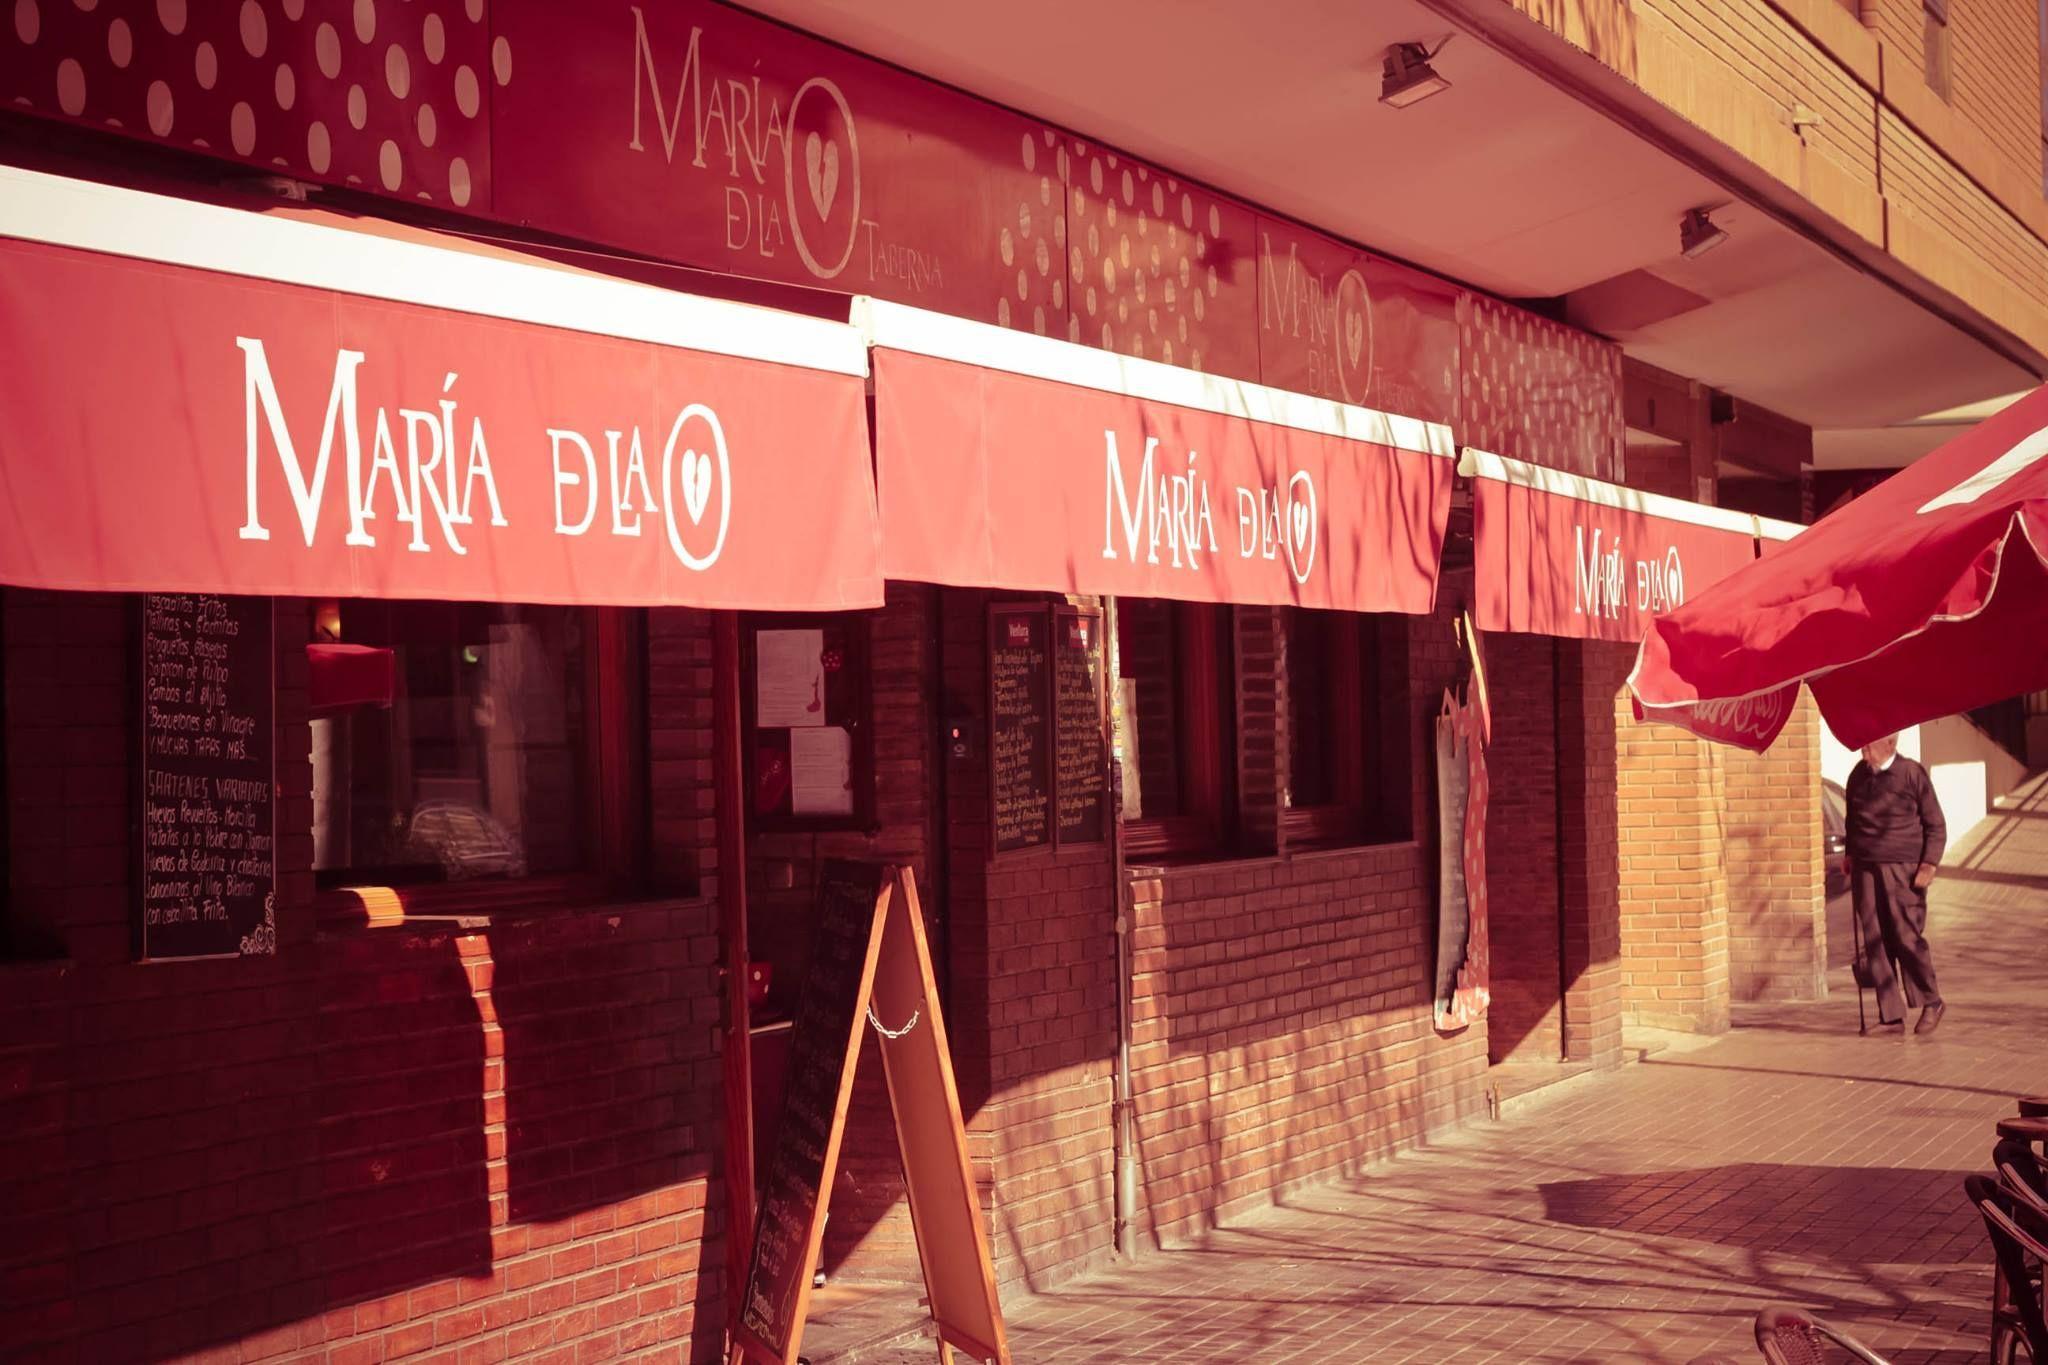 Cocina Tradicional Valenciana | Cocina Valenciana Tradicional Maria De La O